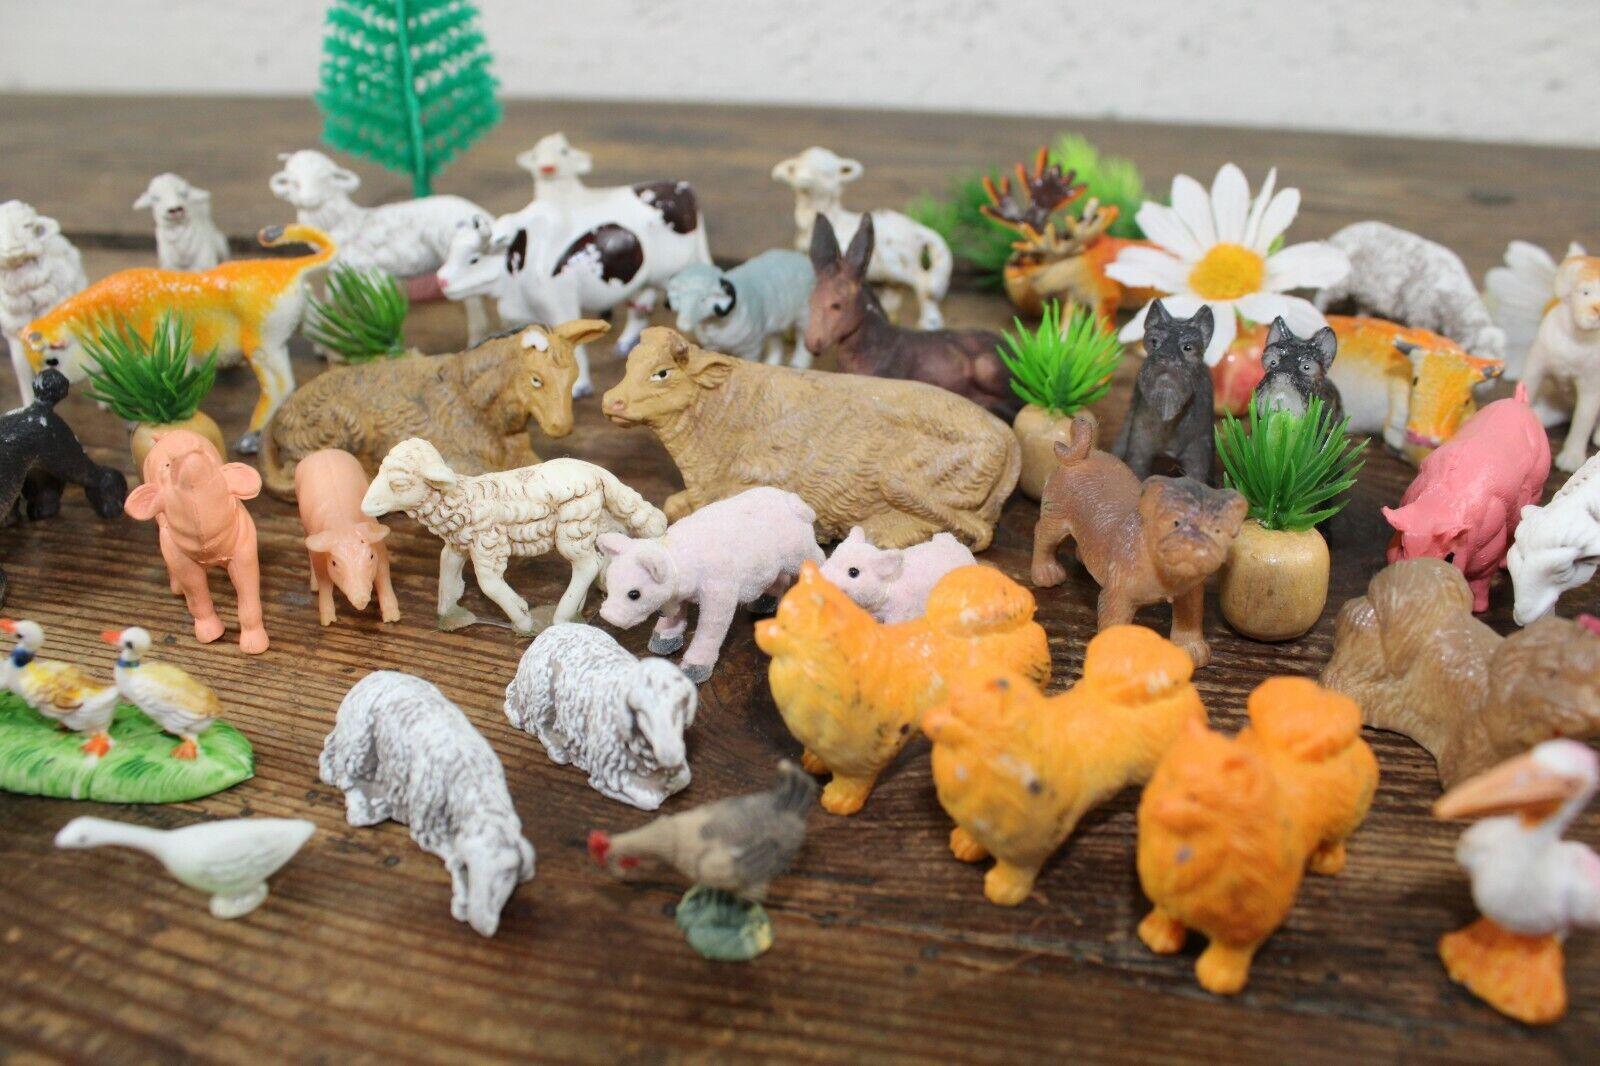 Harvestfly Set di 4 saliera e peperoncino modellazione animale modello animale modello animale